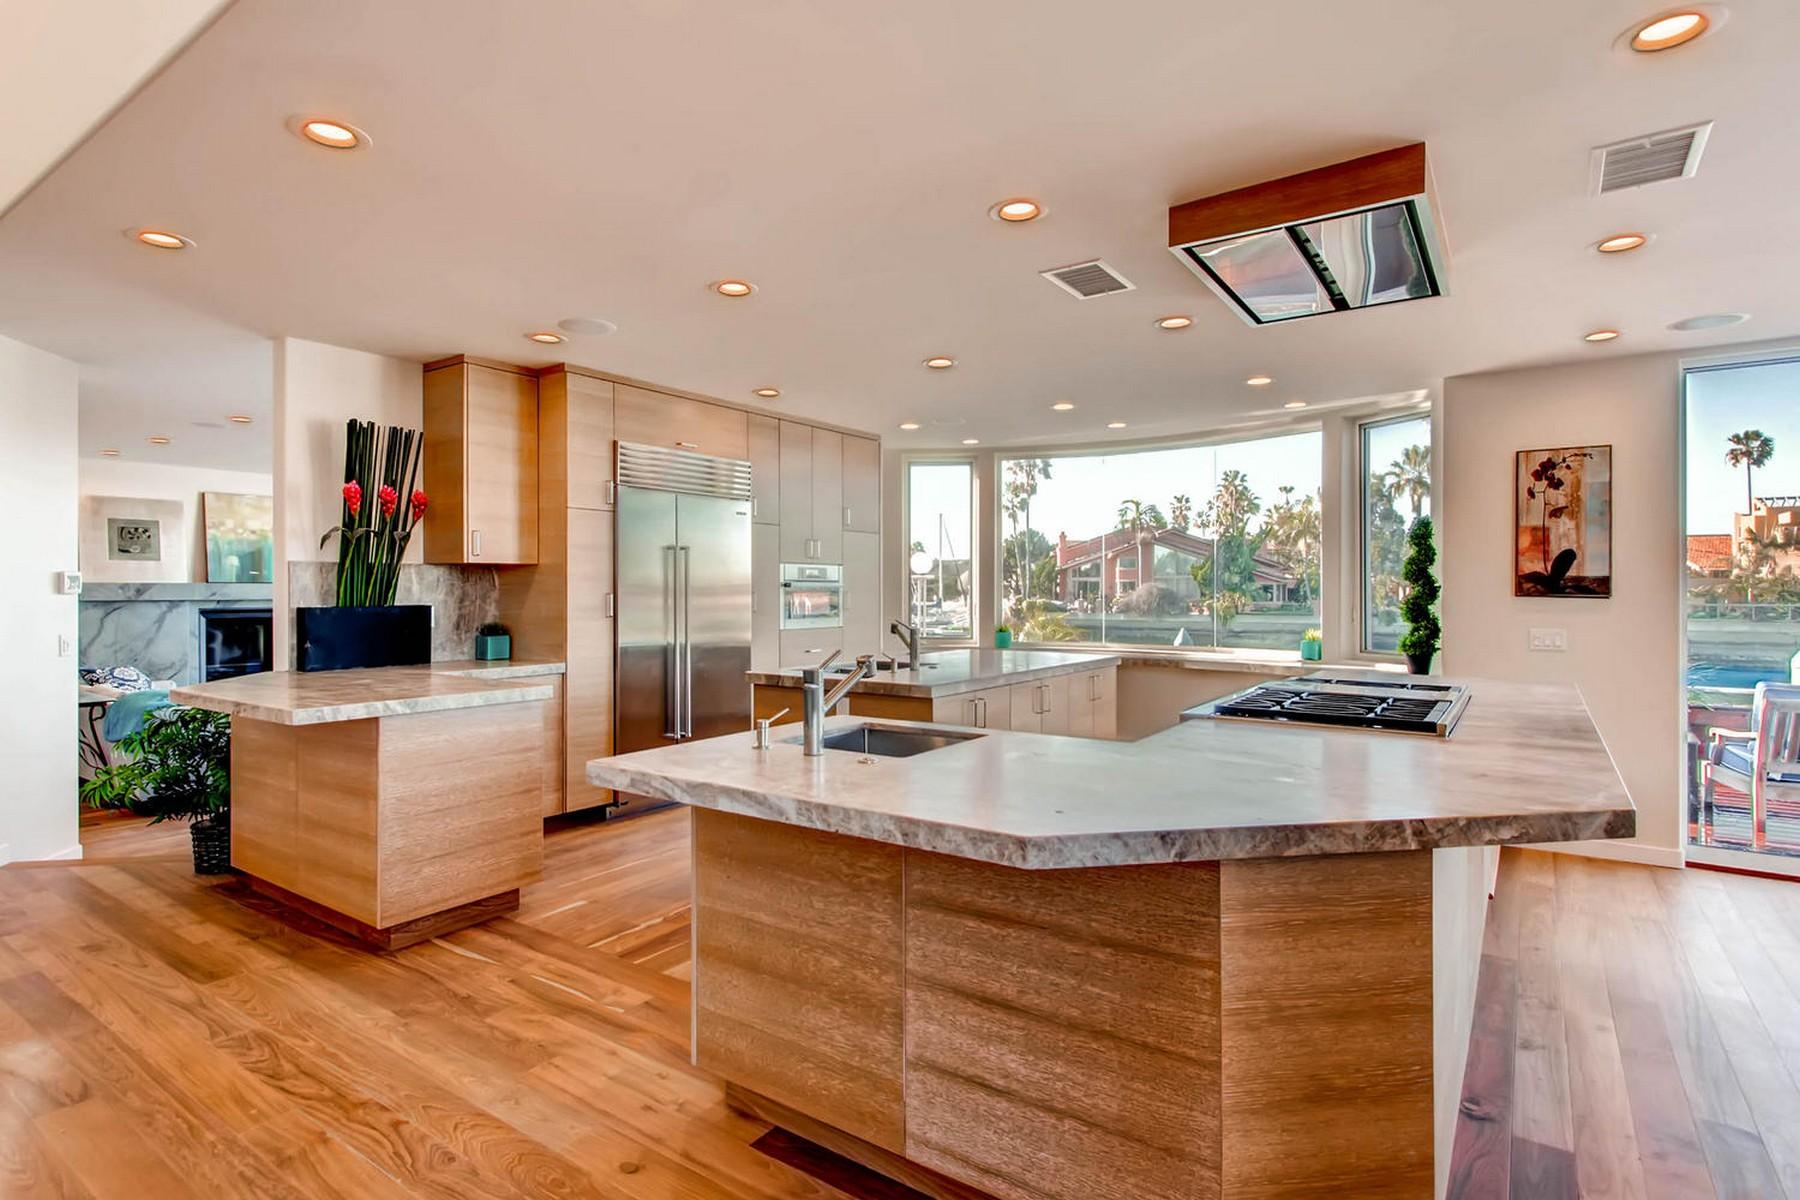 Additional photo for property listing at 4 Spinnaker Way  Coronado, California 92118 Estados Unidos